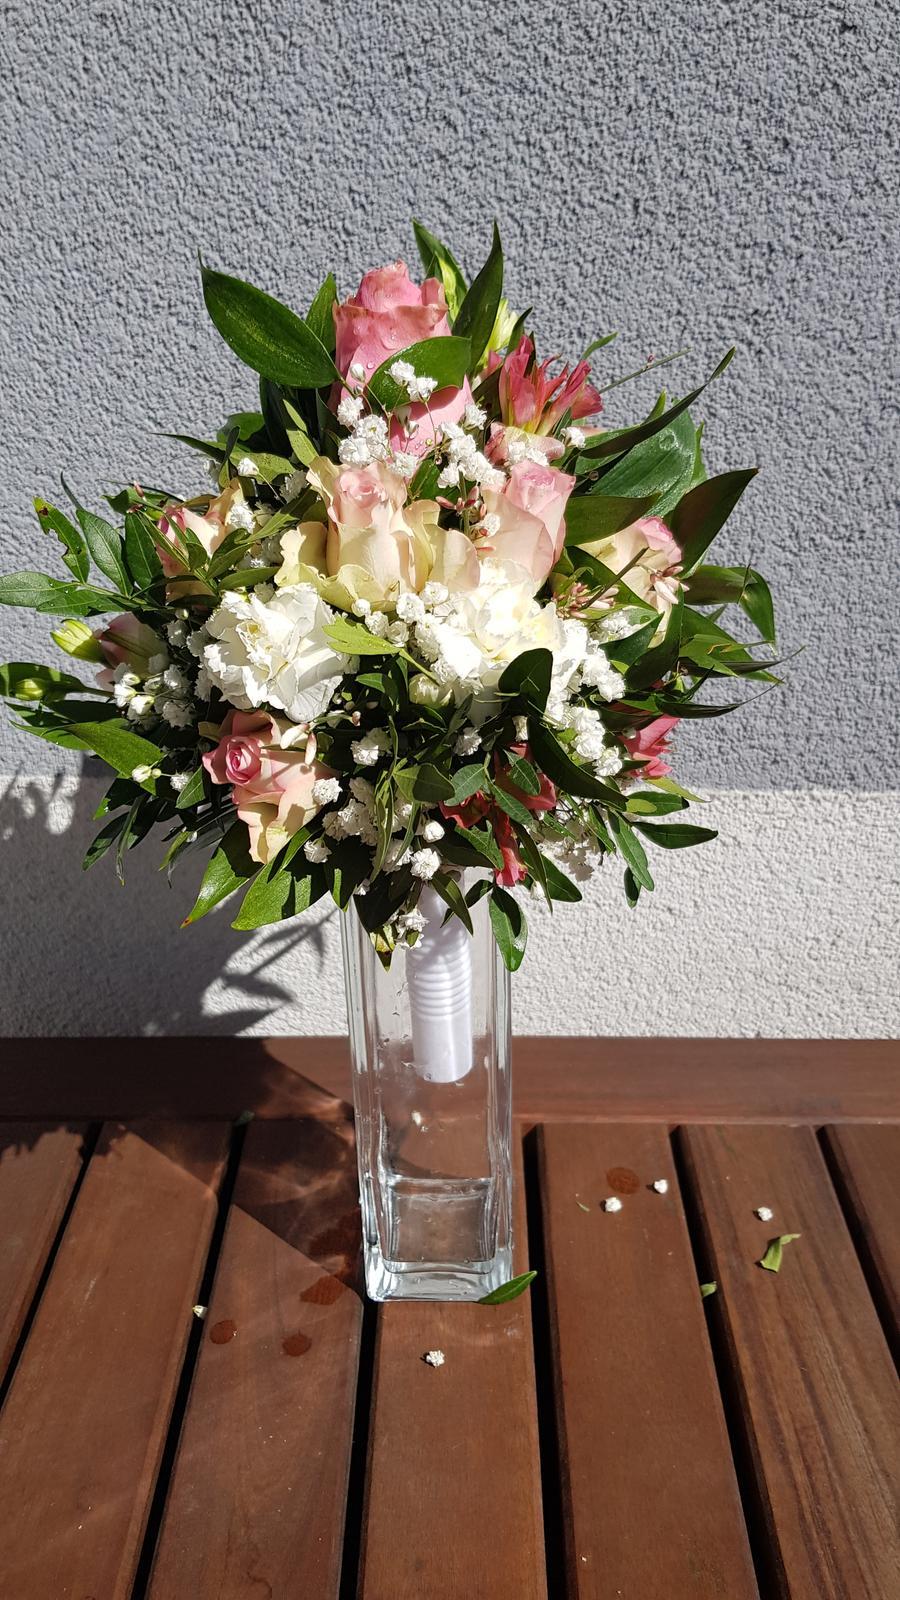 Svatební-kviti - Obrázek č. 5